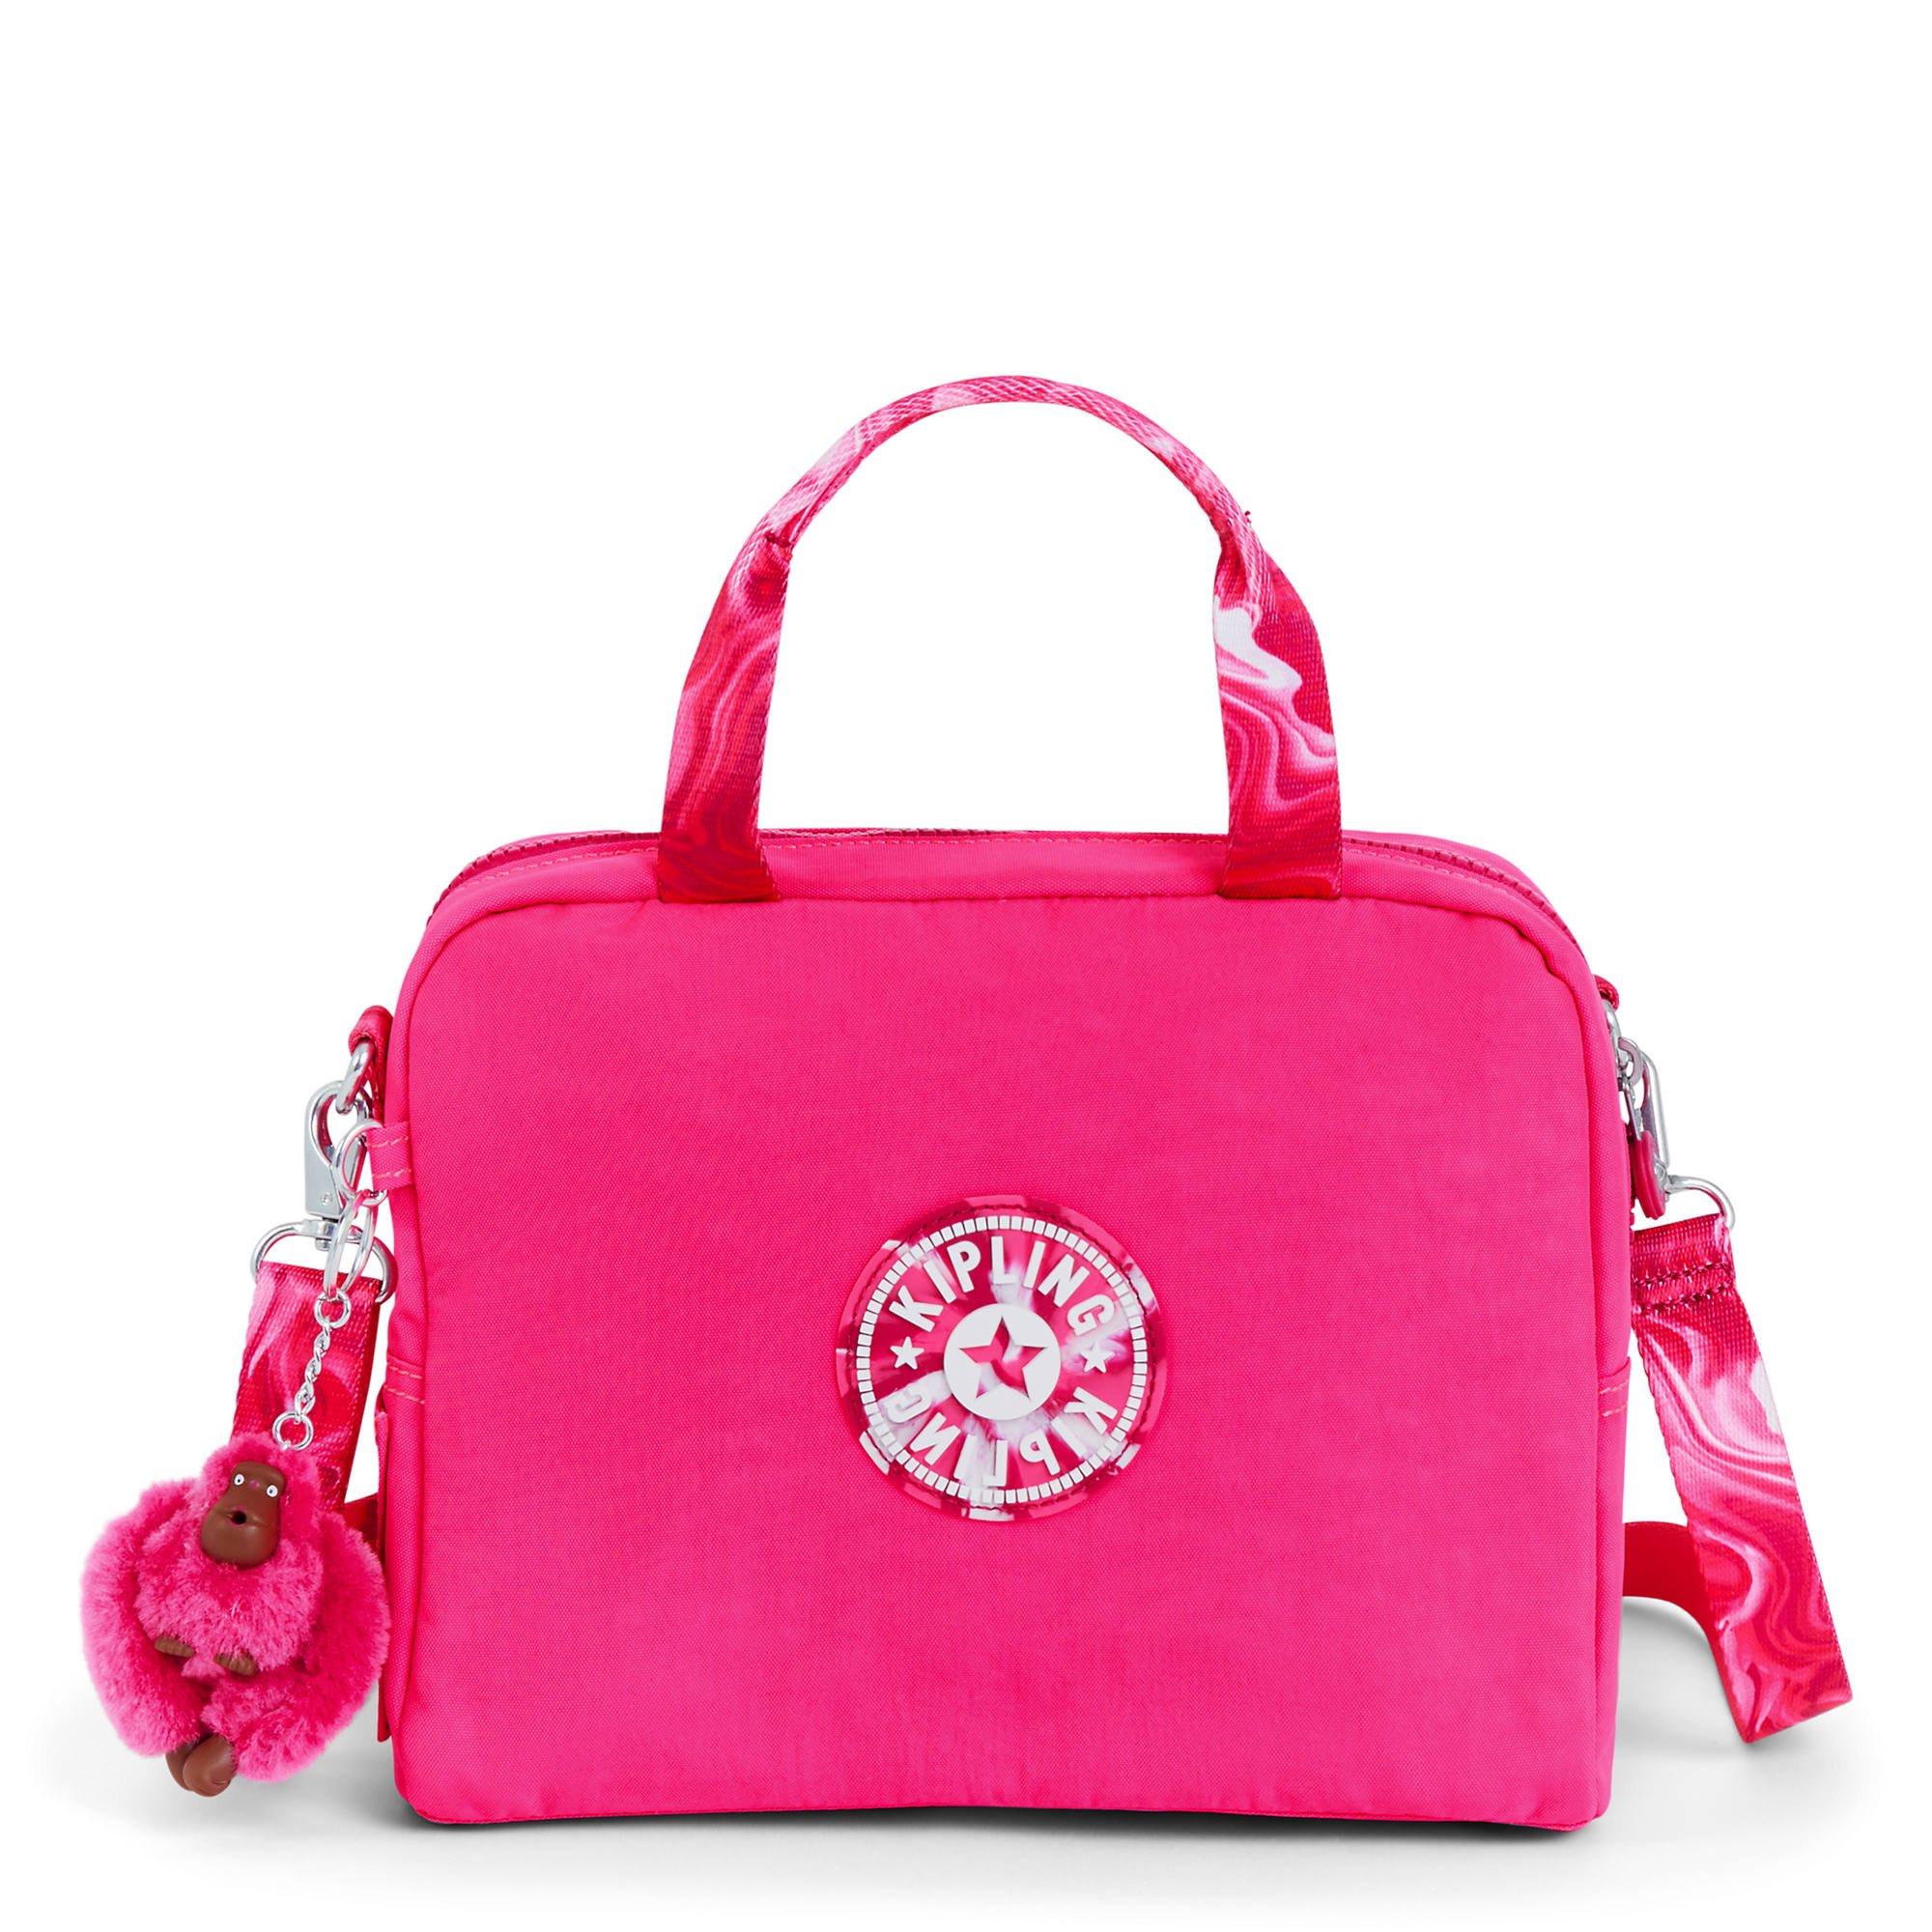 Kipling Women's Piper Lunch Bag One Size Surfer Pink